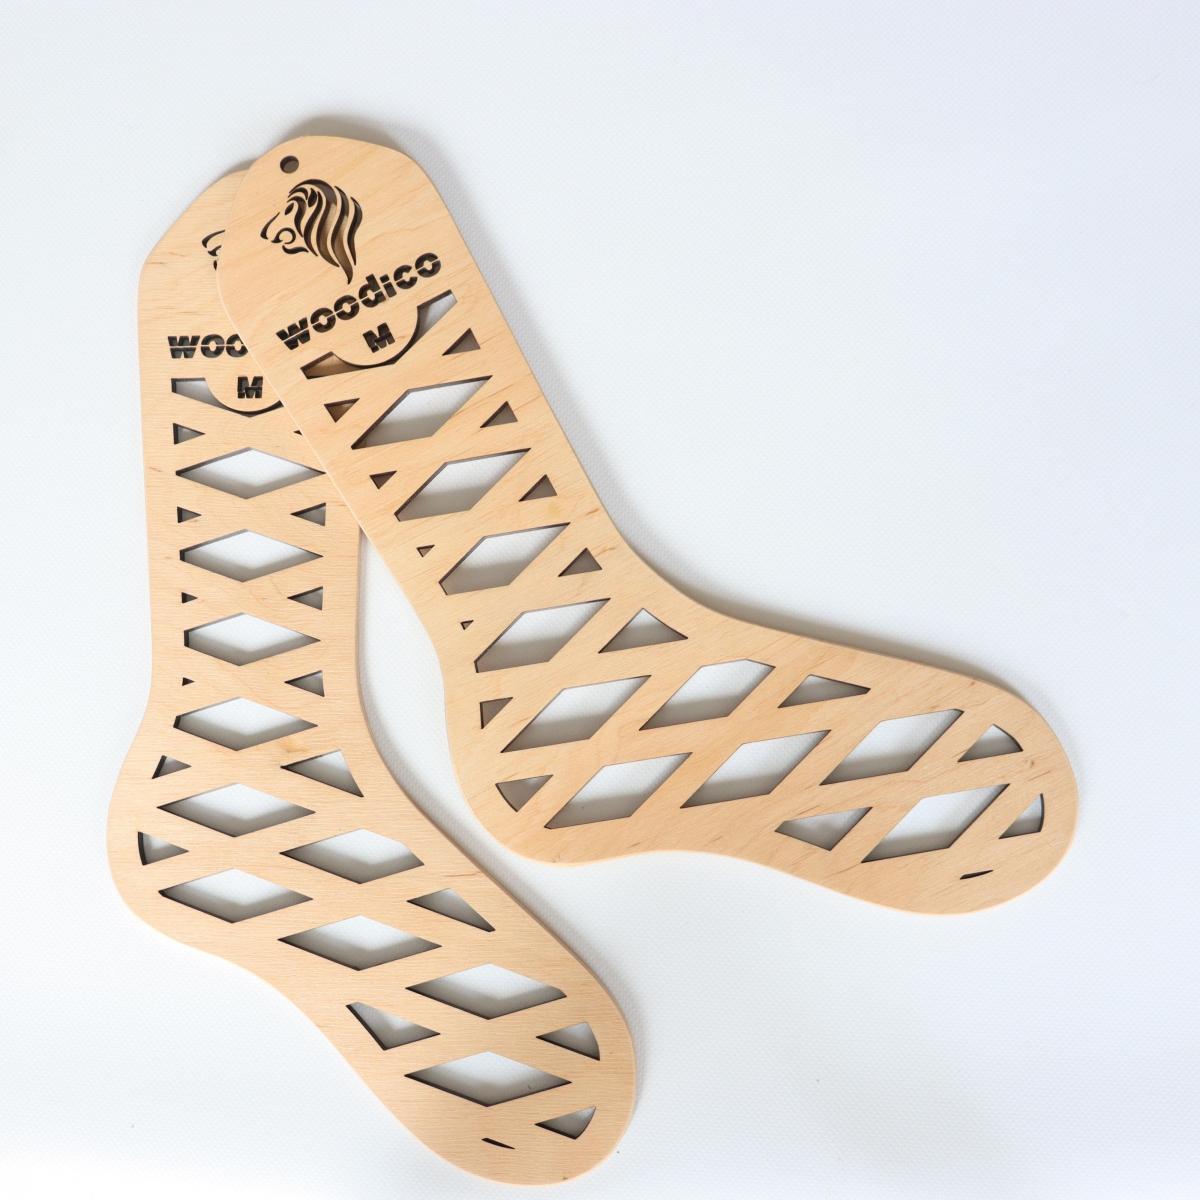 woodico.pro wooden sock blockers leo 18 1200x1200 - Wooden sock blockers / Leo